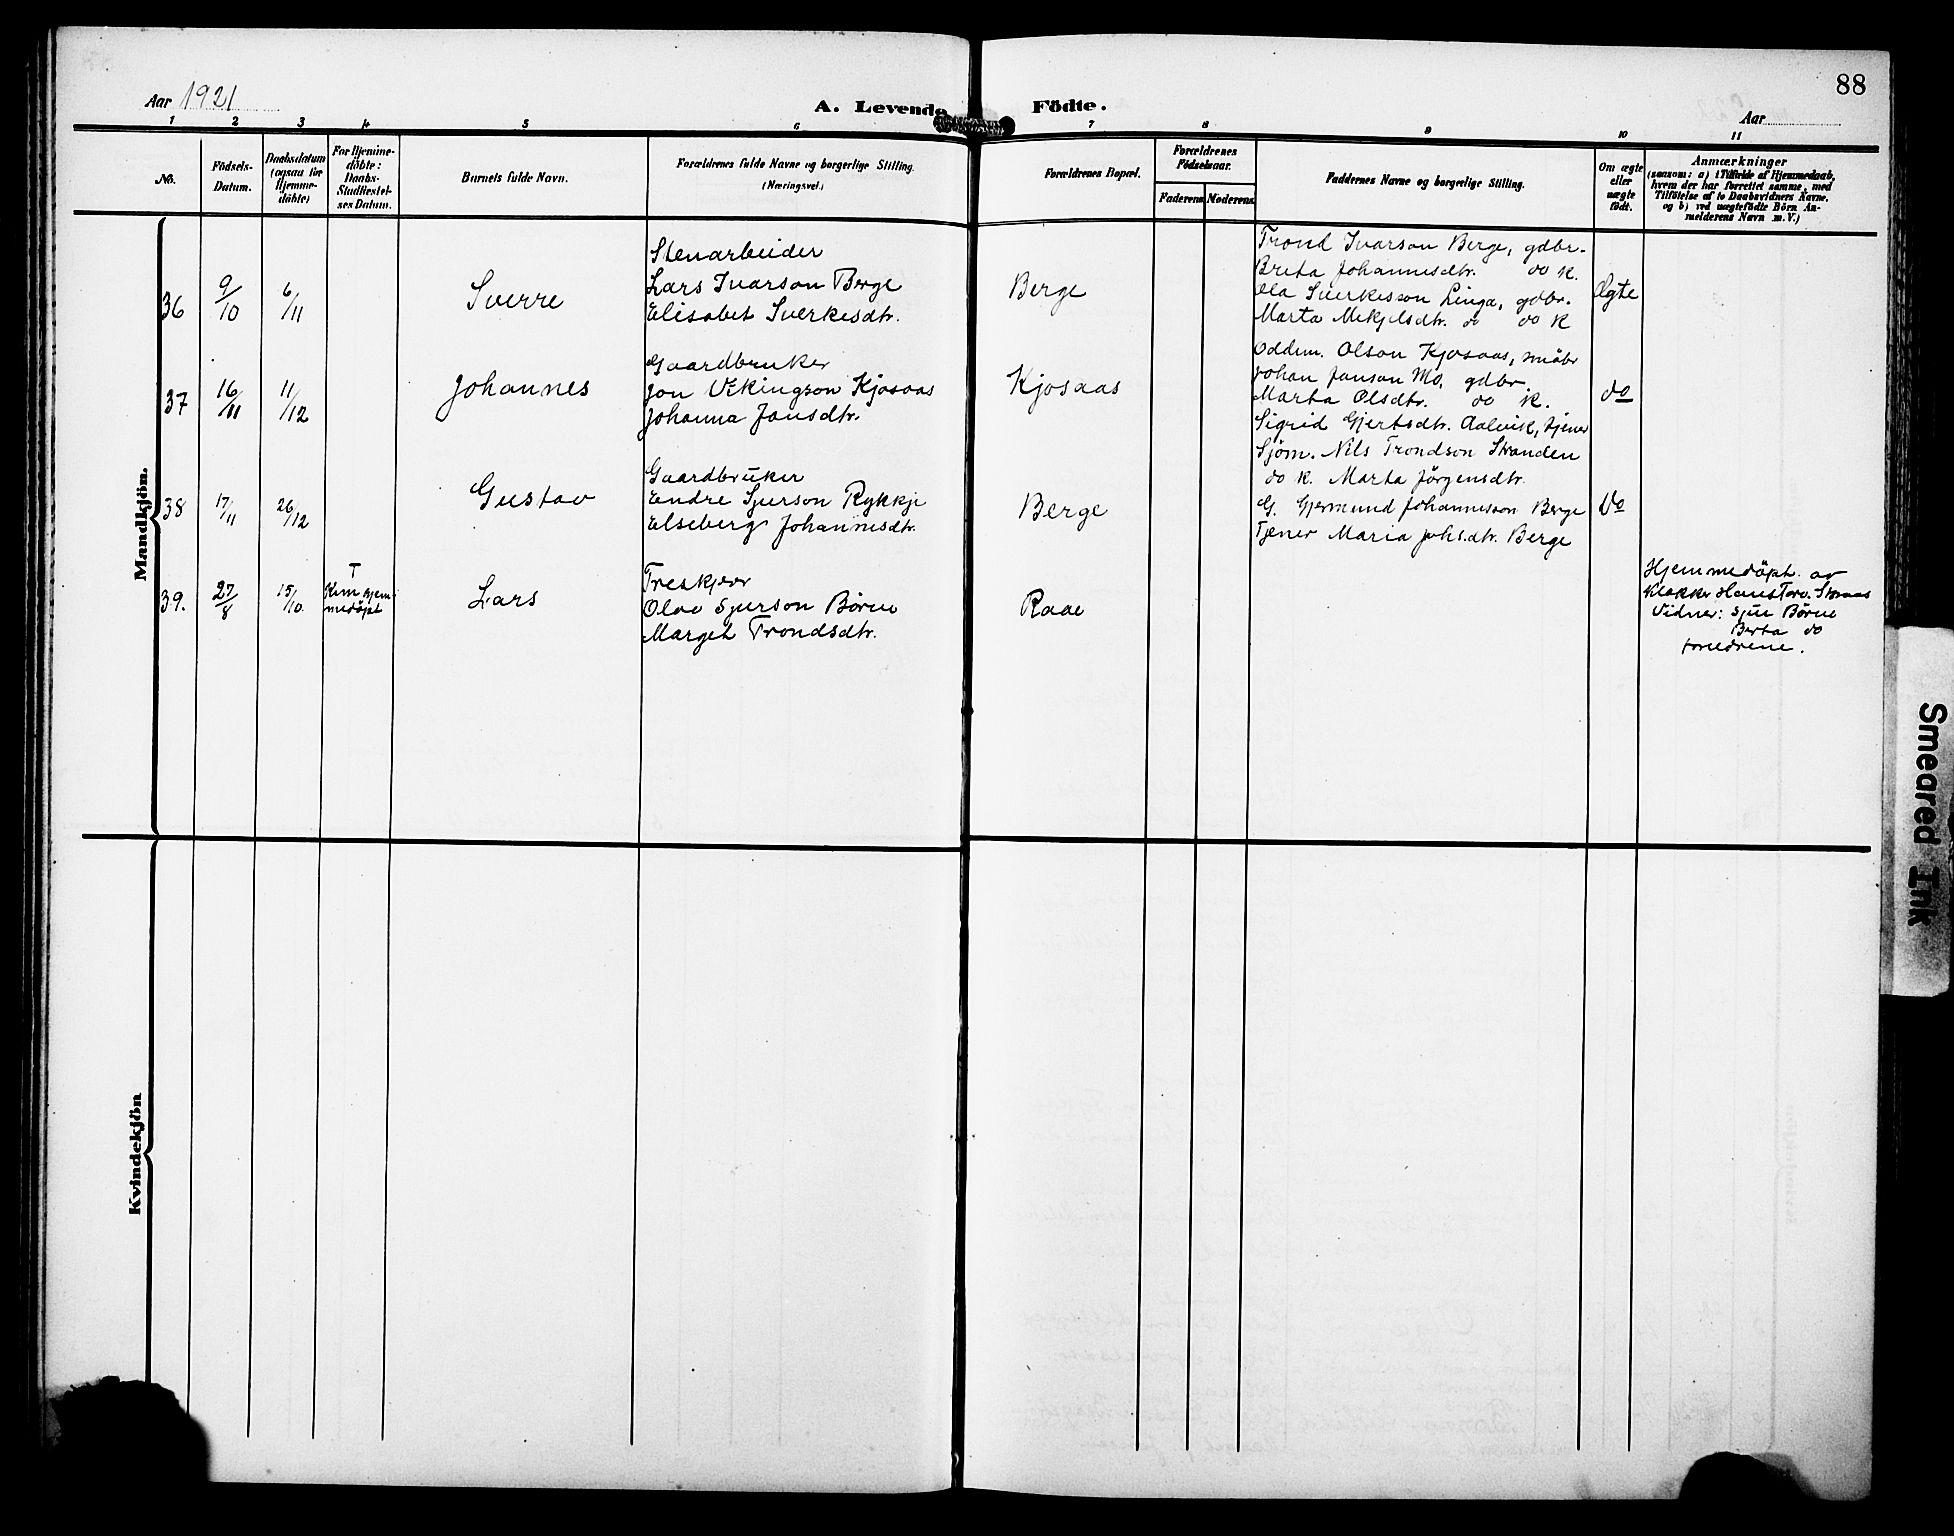 SAB, Kvam sokneprestembete, H/Hab: Klokkerbok nr. C 4, 1906-1931, s. 88